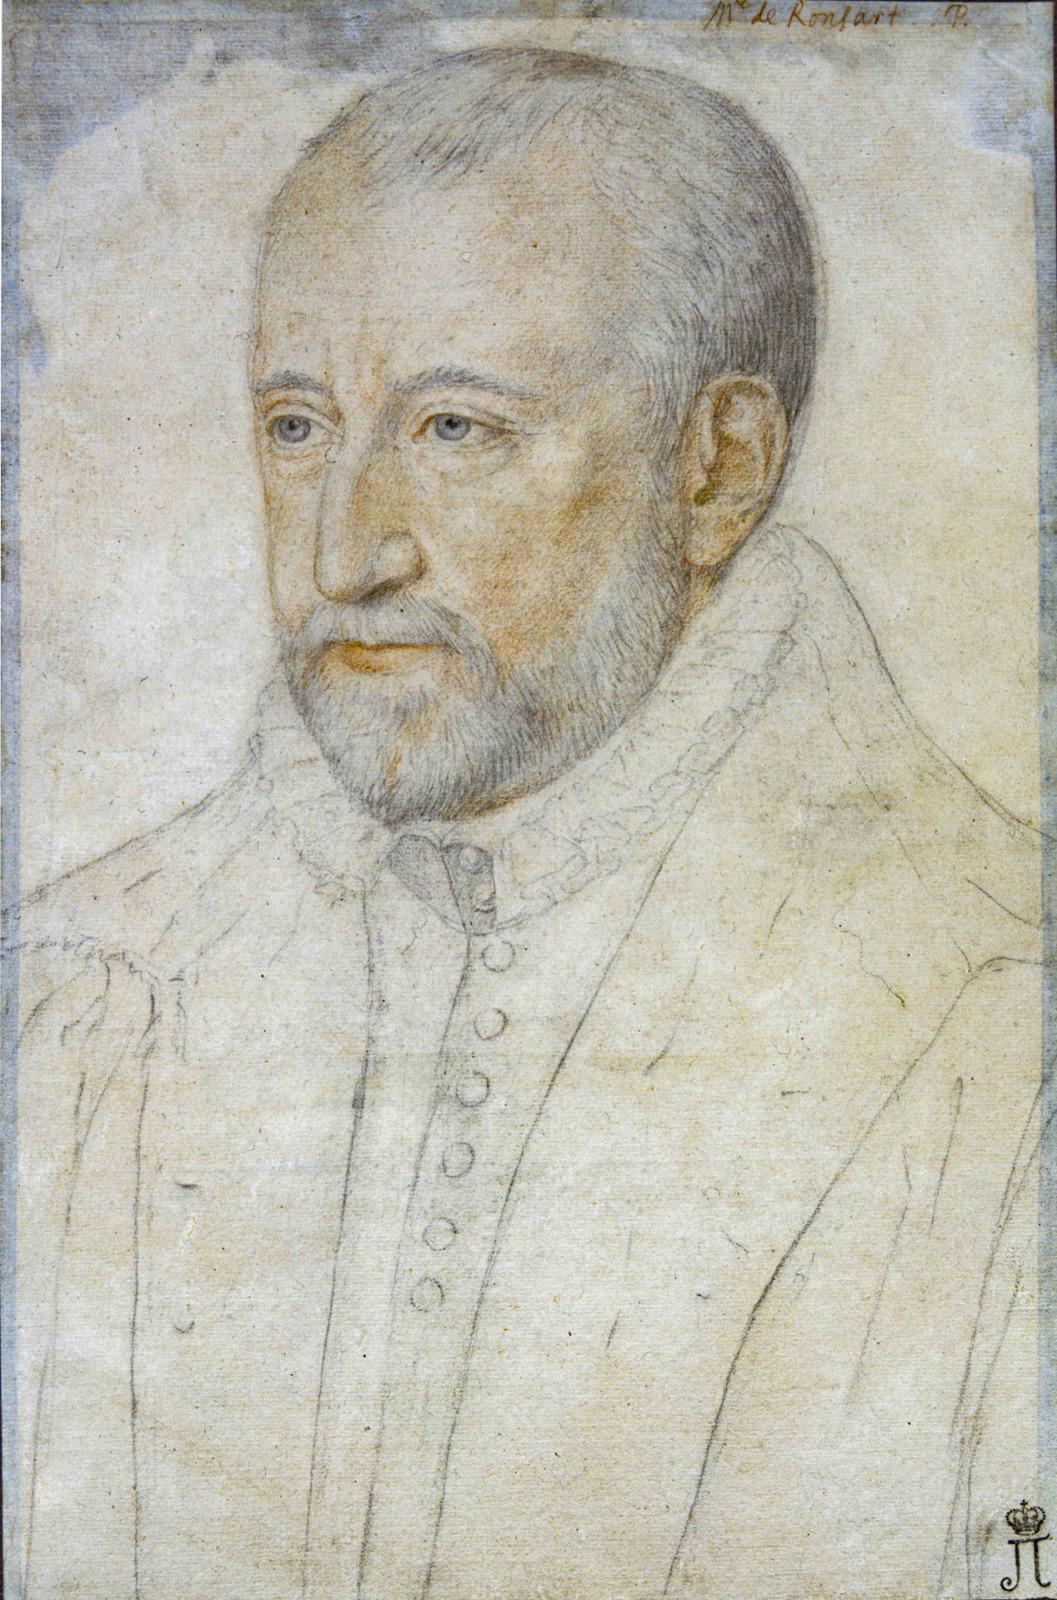 Portrait of Pierre de Ronsard by Benjamin Foulon - circa 1580-1585